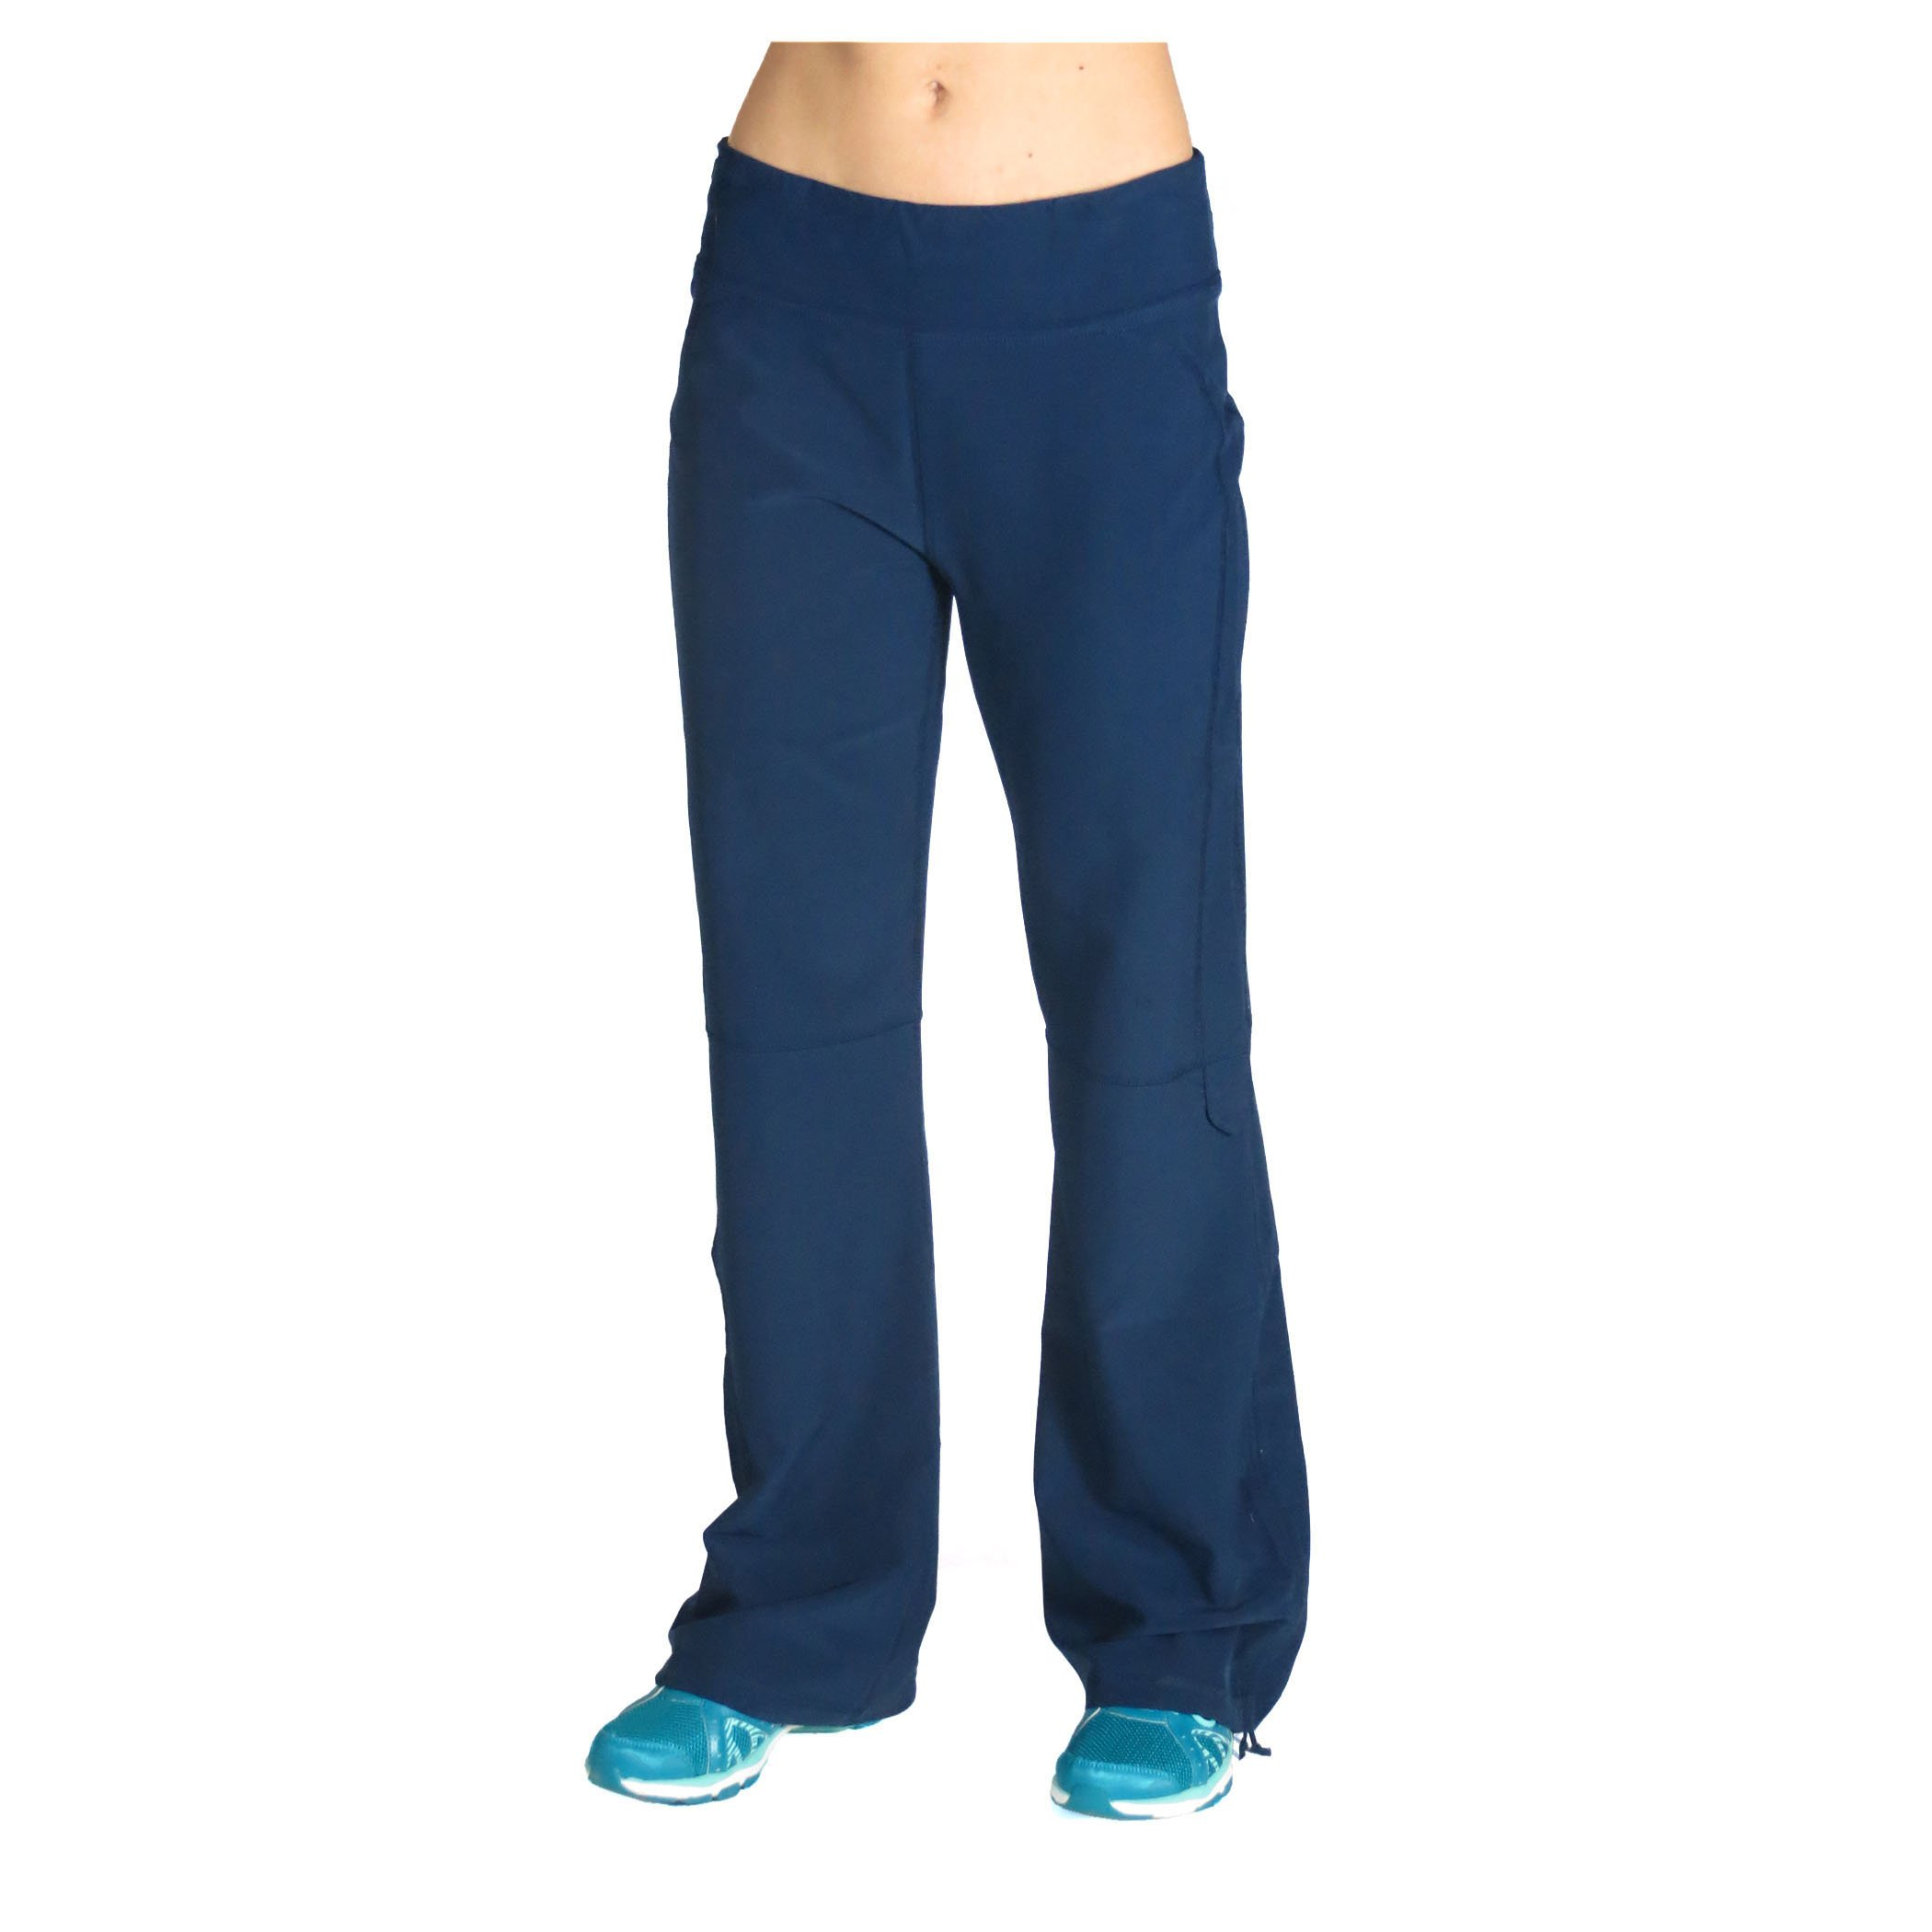 Alex + Abby Women's Plus-Size in-Motion Pant 3X True Blue Navy